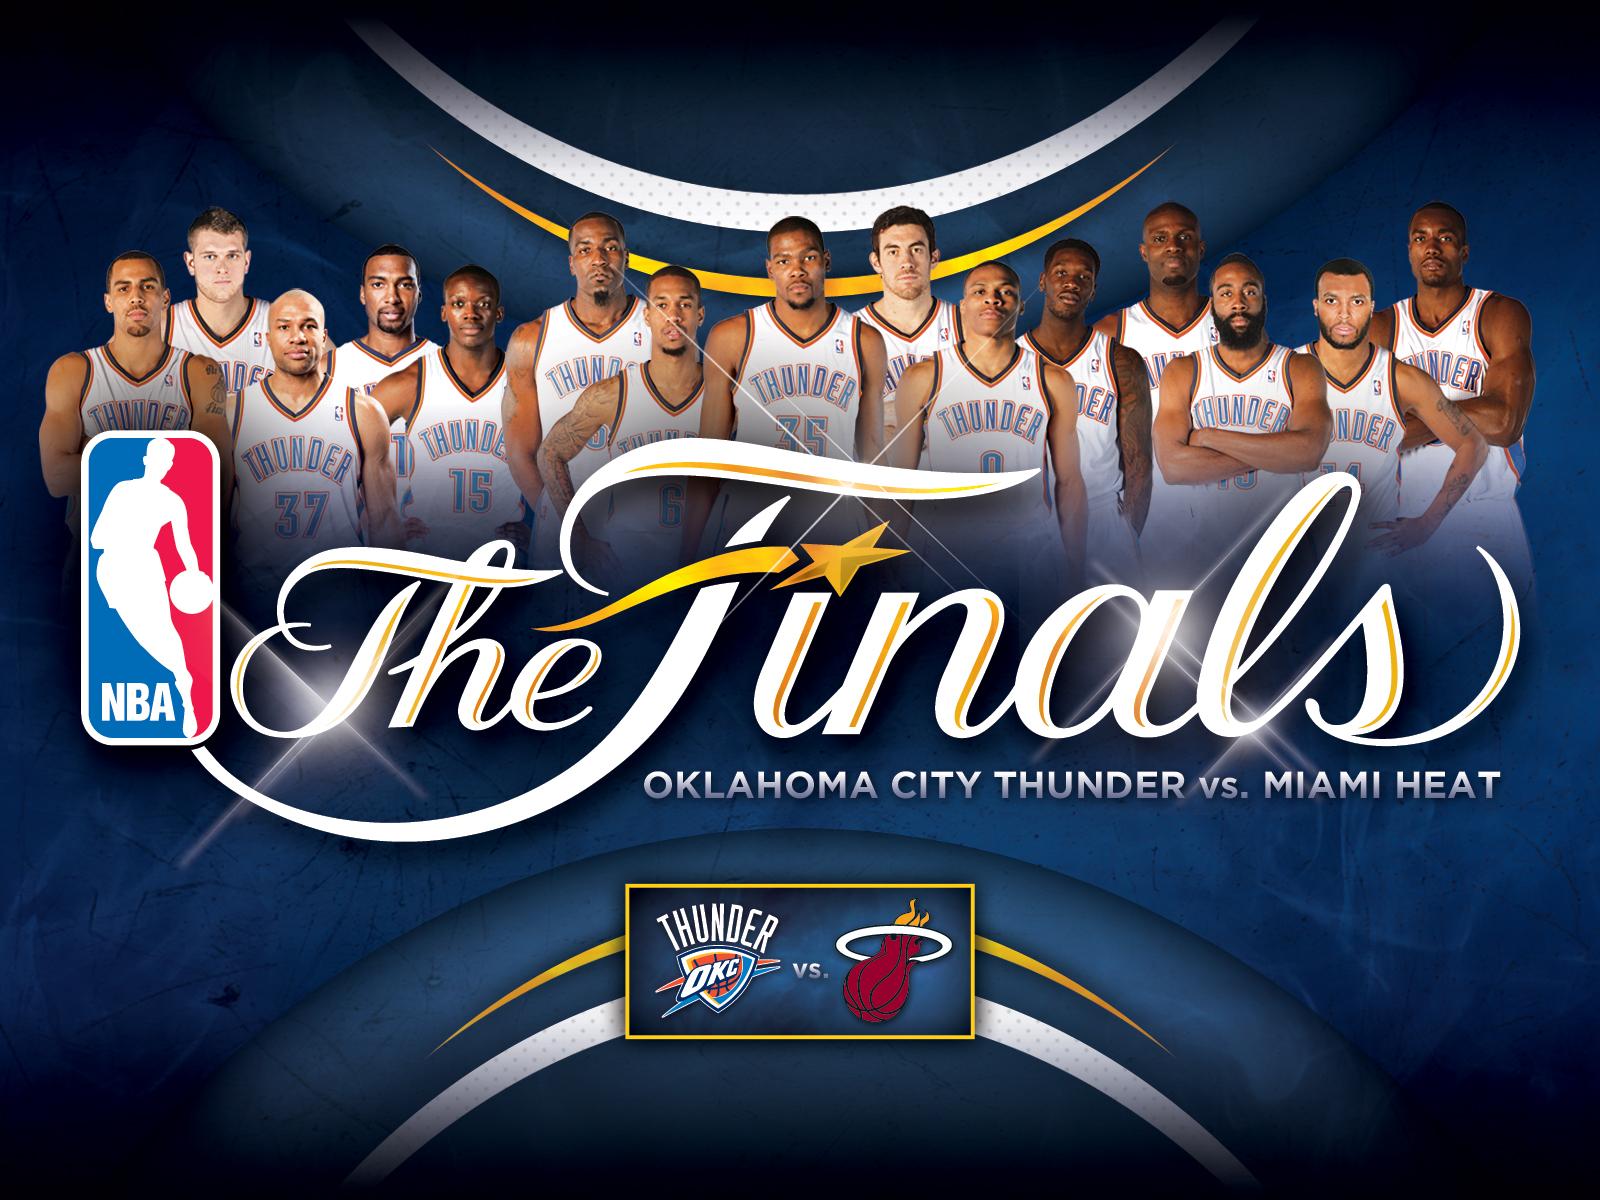 OKLAHOMA CITY THUNDER basketball nba g wallpaper 1600x1200 158379 1600x1200